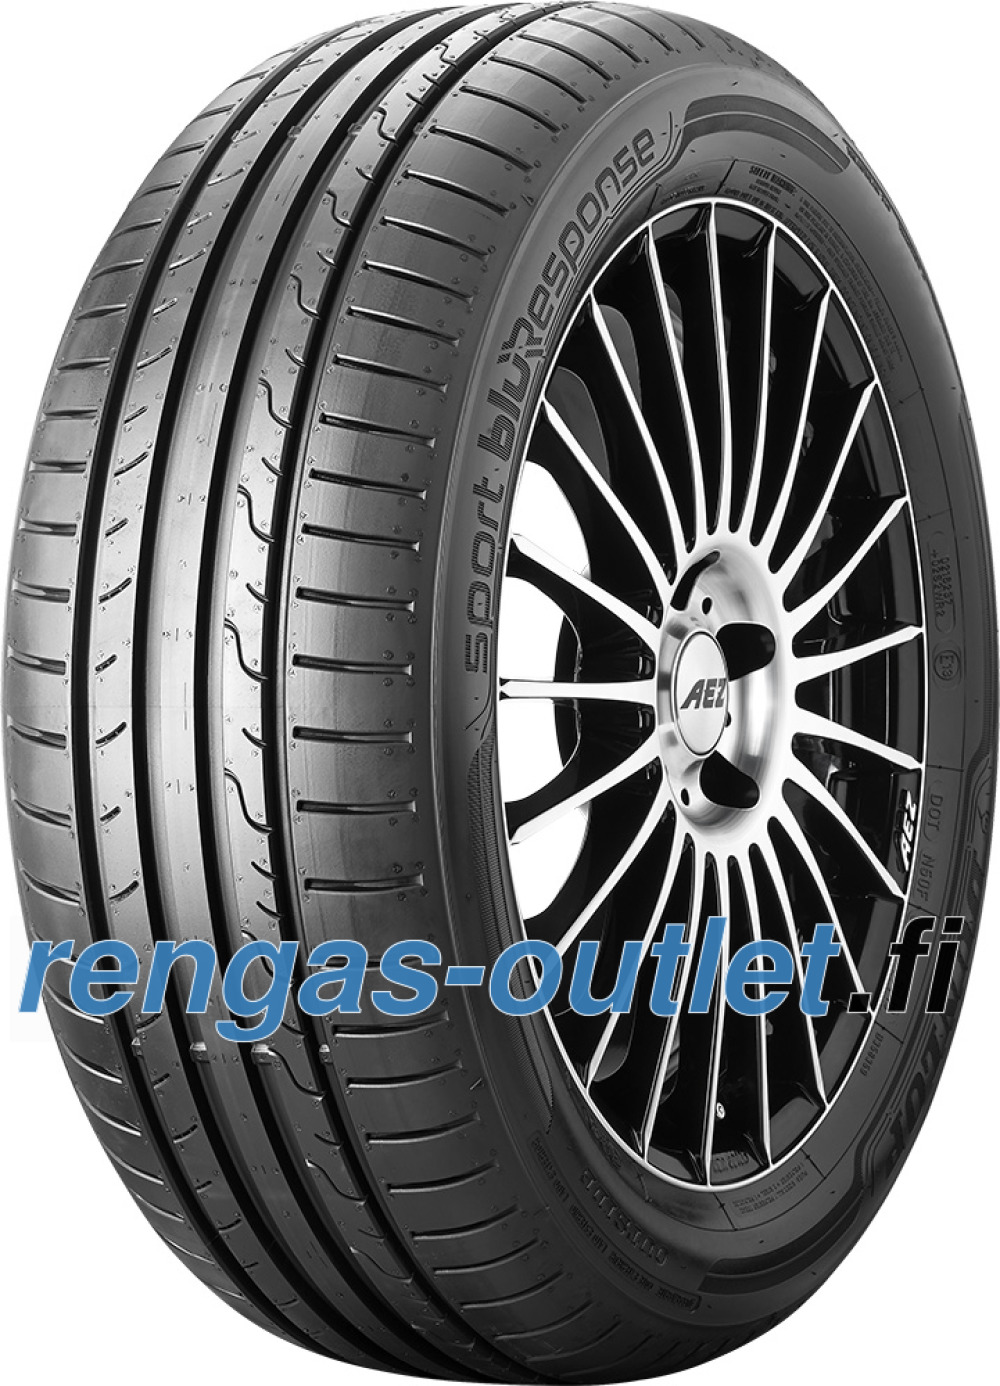 Dunlop Sport BluResponse ( 195/50 R15 82V vannesuojalla (MFS) )